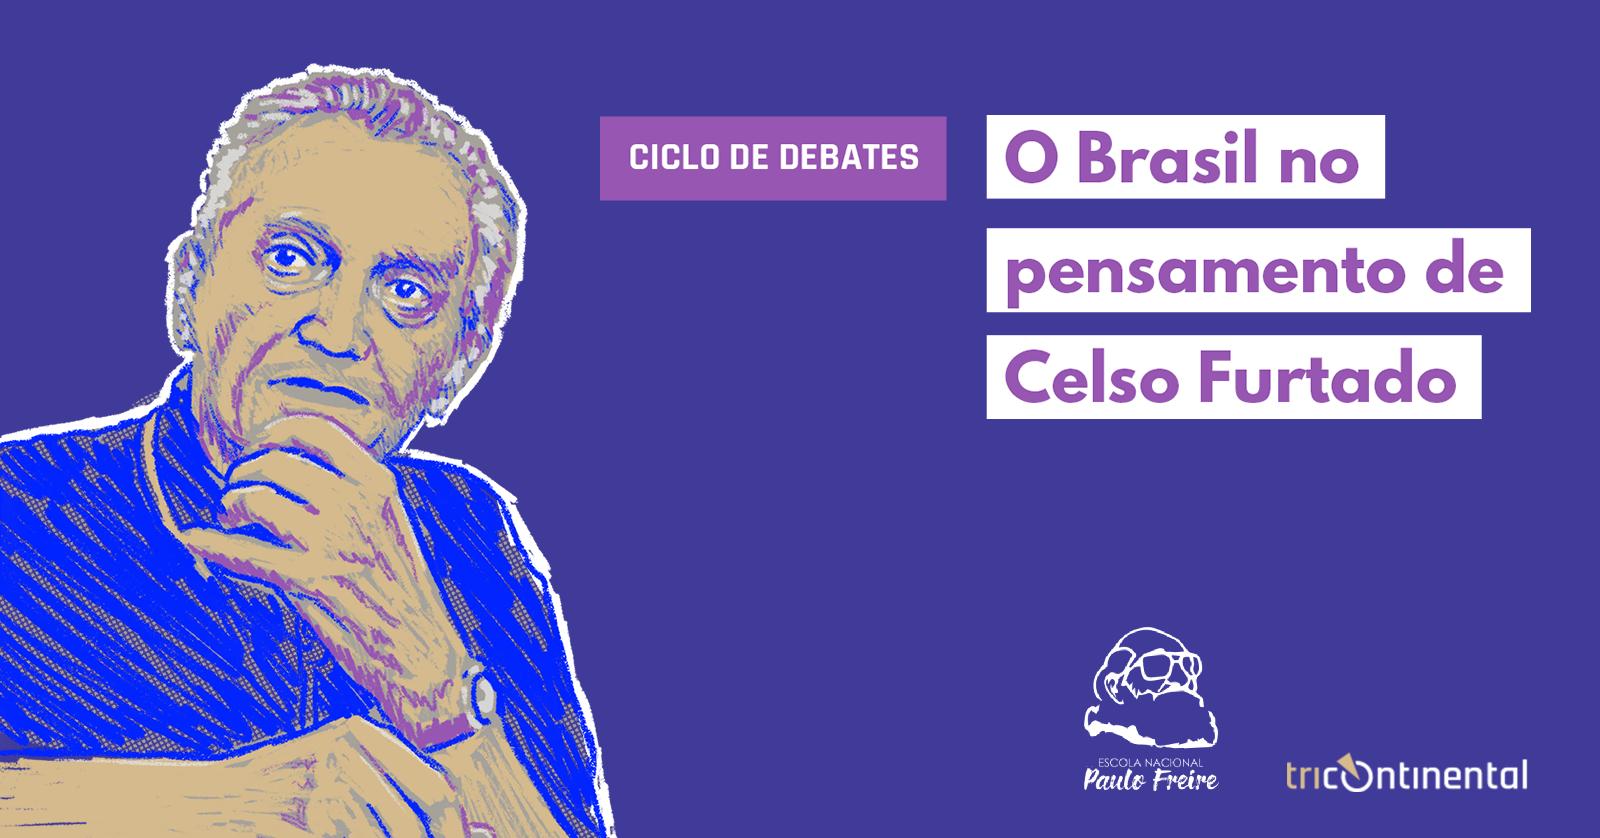 Celso Furtado é tema de ciclo de debates da Escola Nacional Paulo Freire